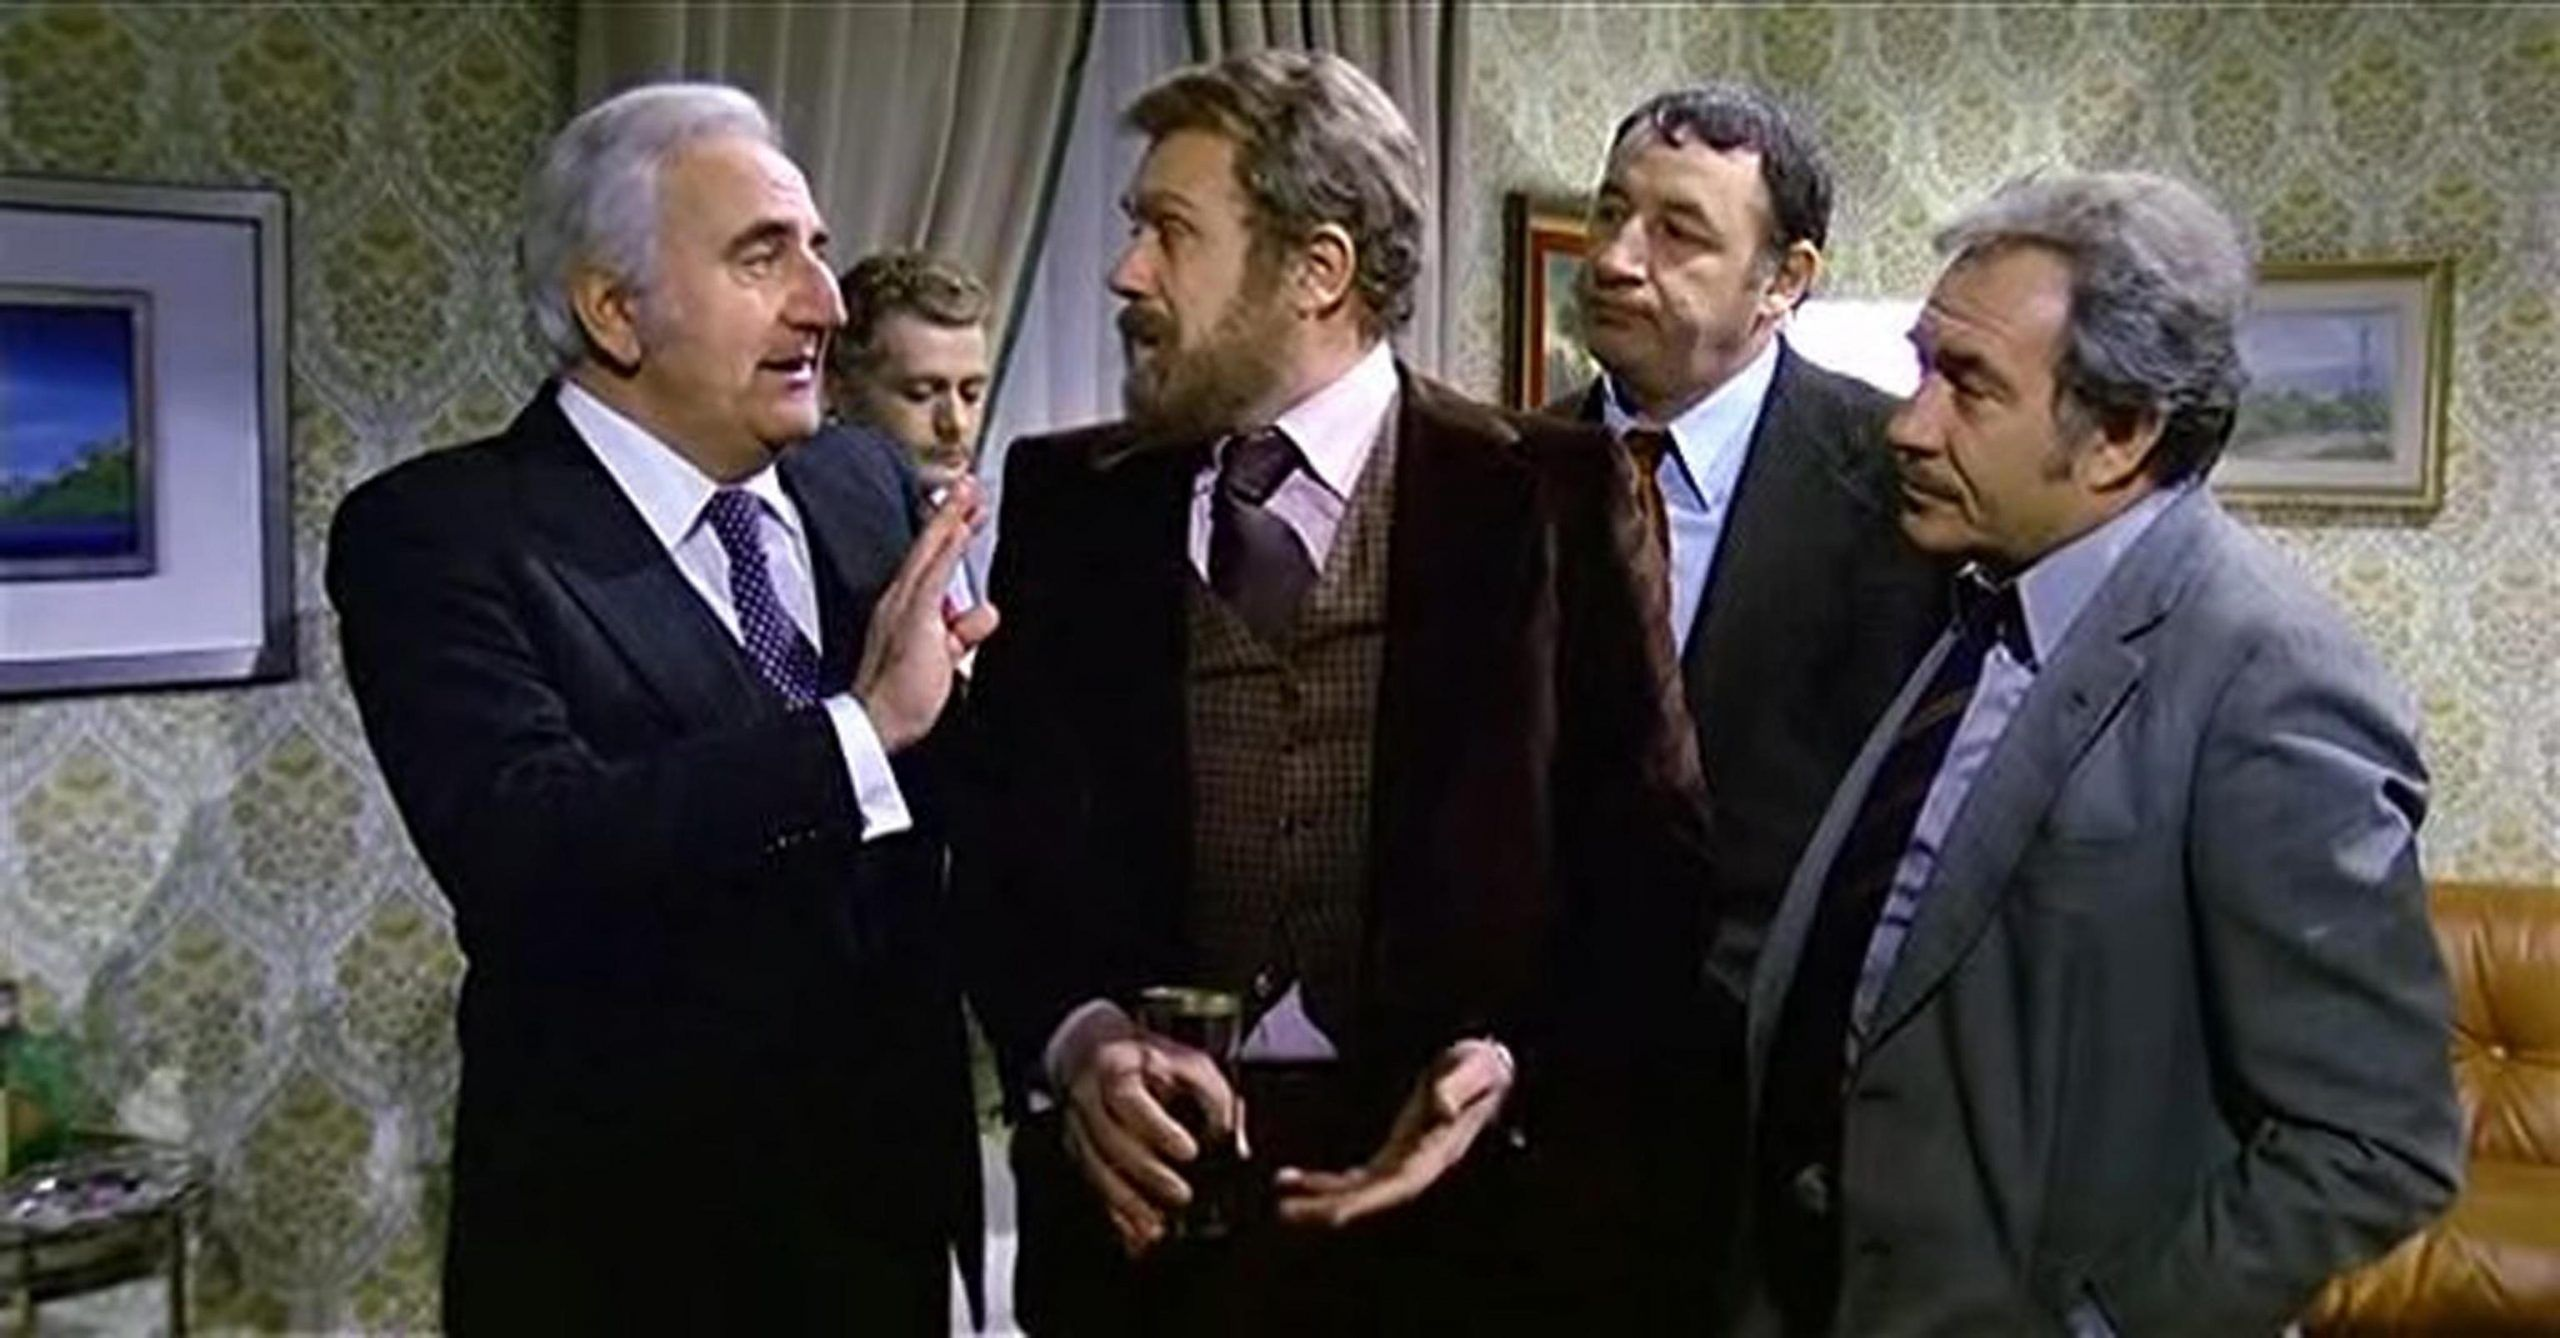 ++ Cinema: è morto Gastone Moschin ++